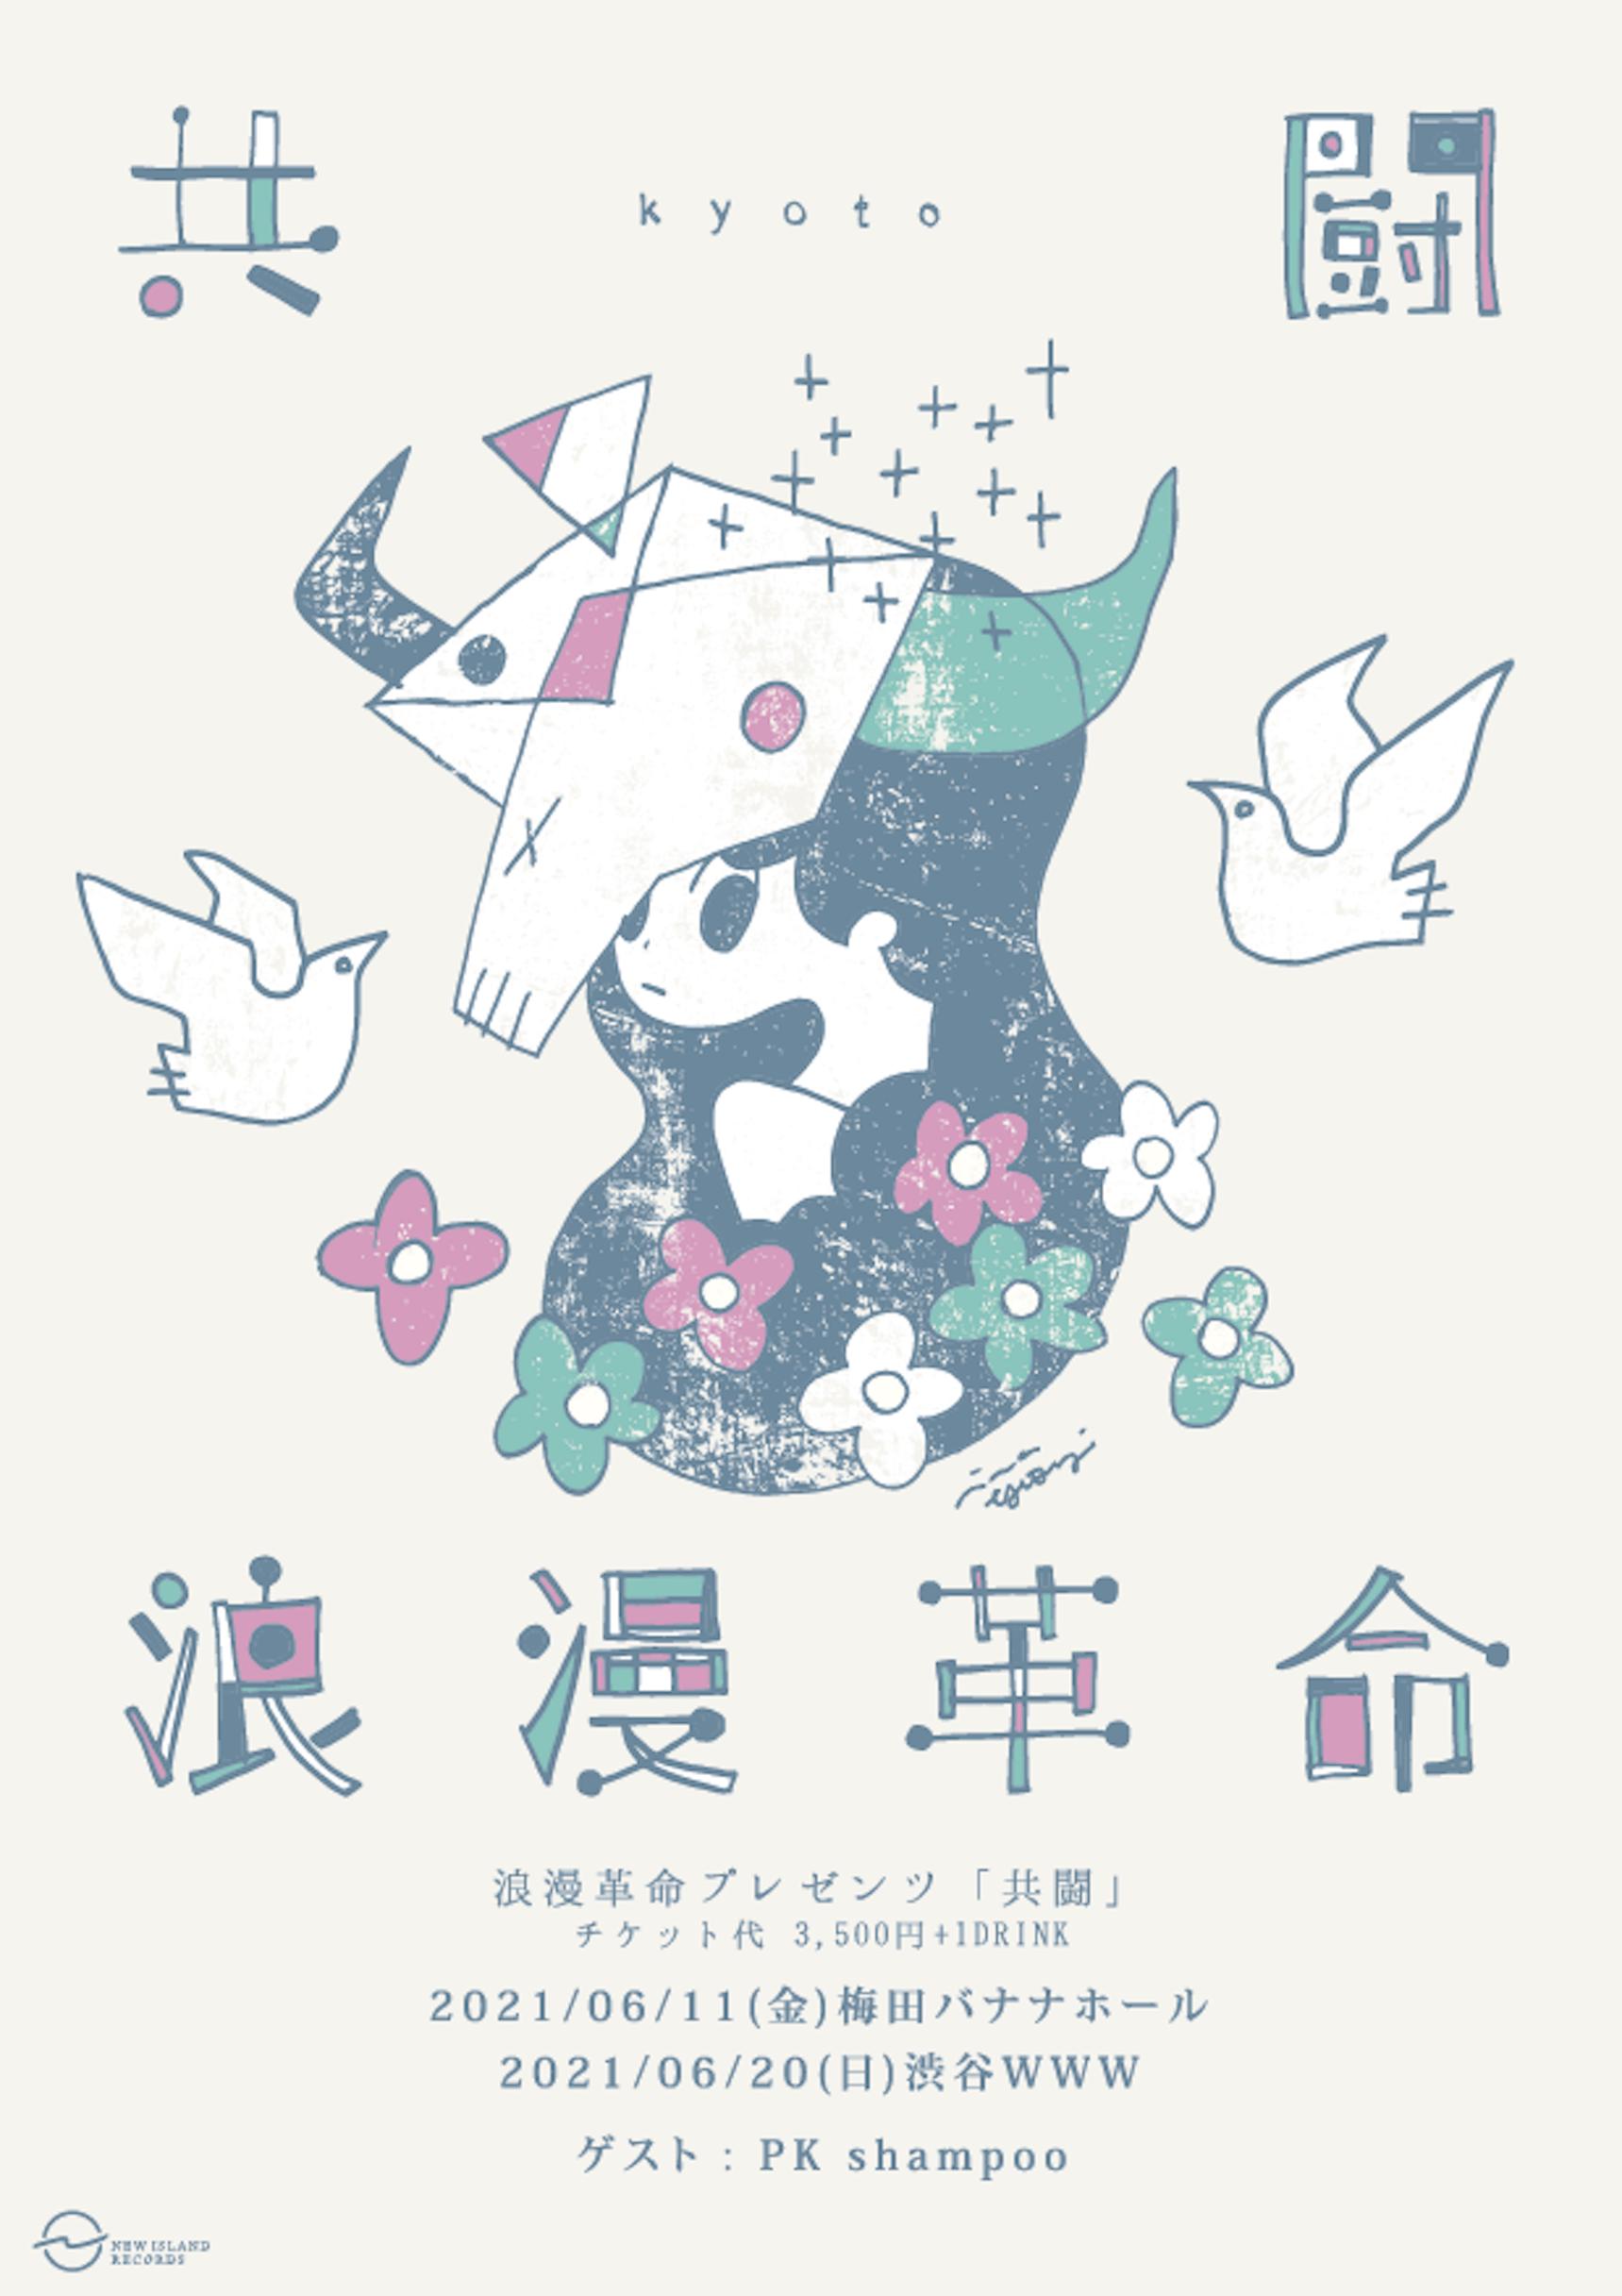 浪漫革命 / PK shampoo